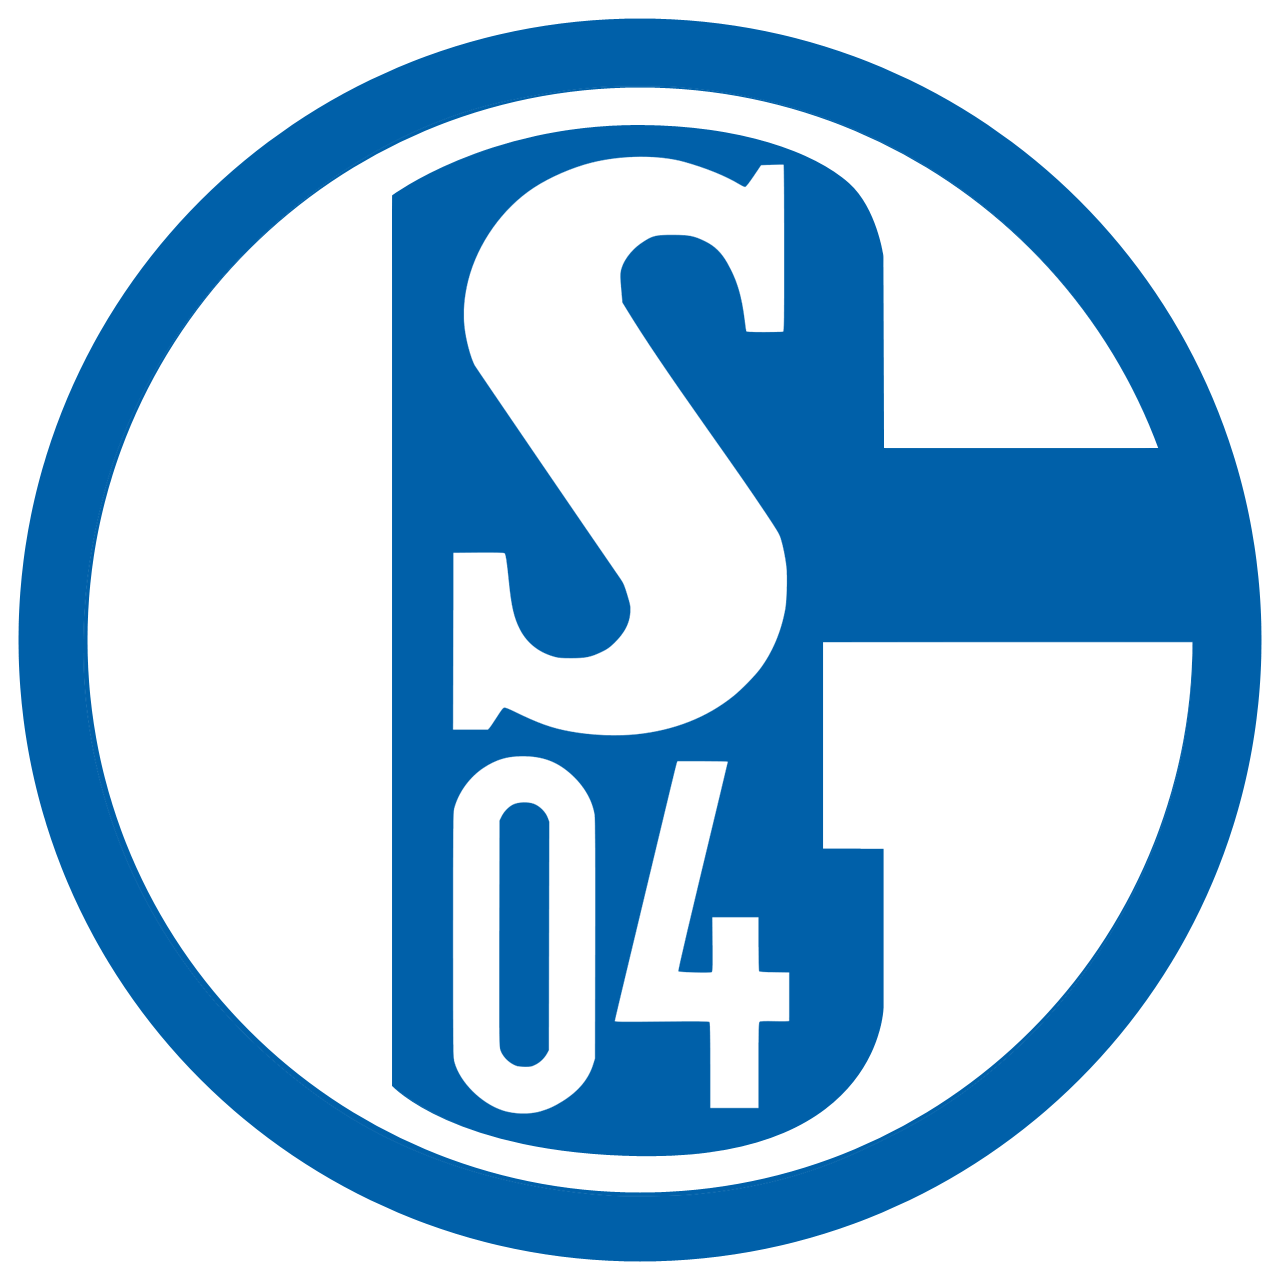 FC Schalke 04 Logo Wallpaper